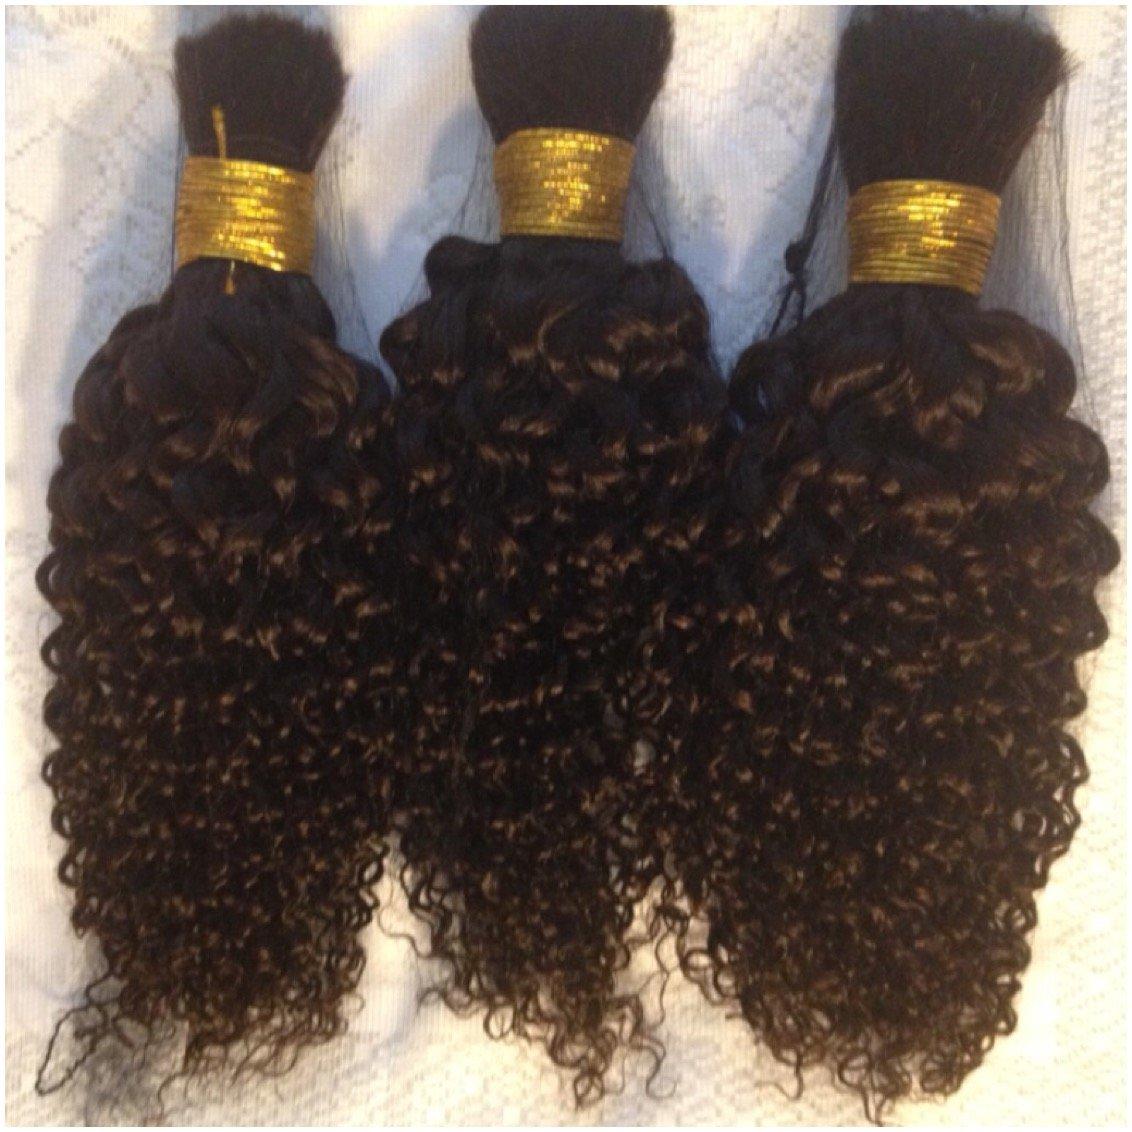 "Kinky Curly 100% Human Brazilian Bulk Hair For Tree Braids, Brazilian Knots, Braiding, Etc. 14"" Dark Brown/2 Darker Shade Than Color 4 Dyeable 3 BUNDLES"